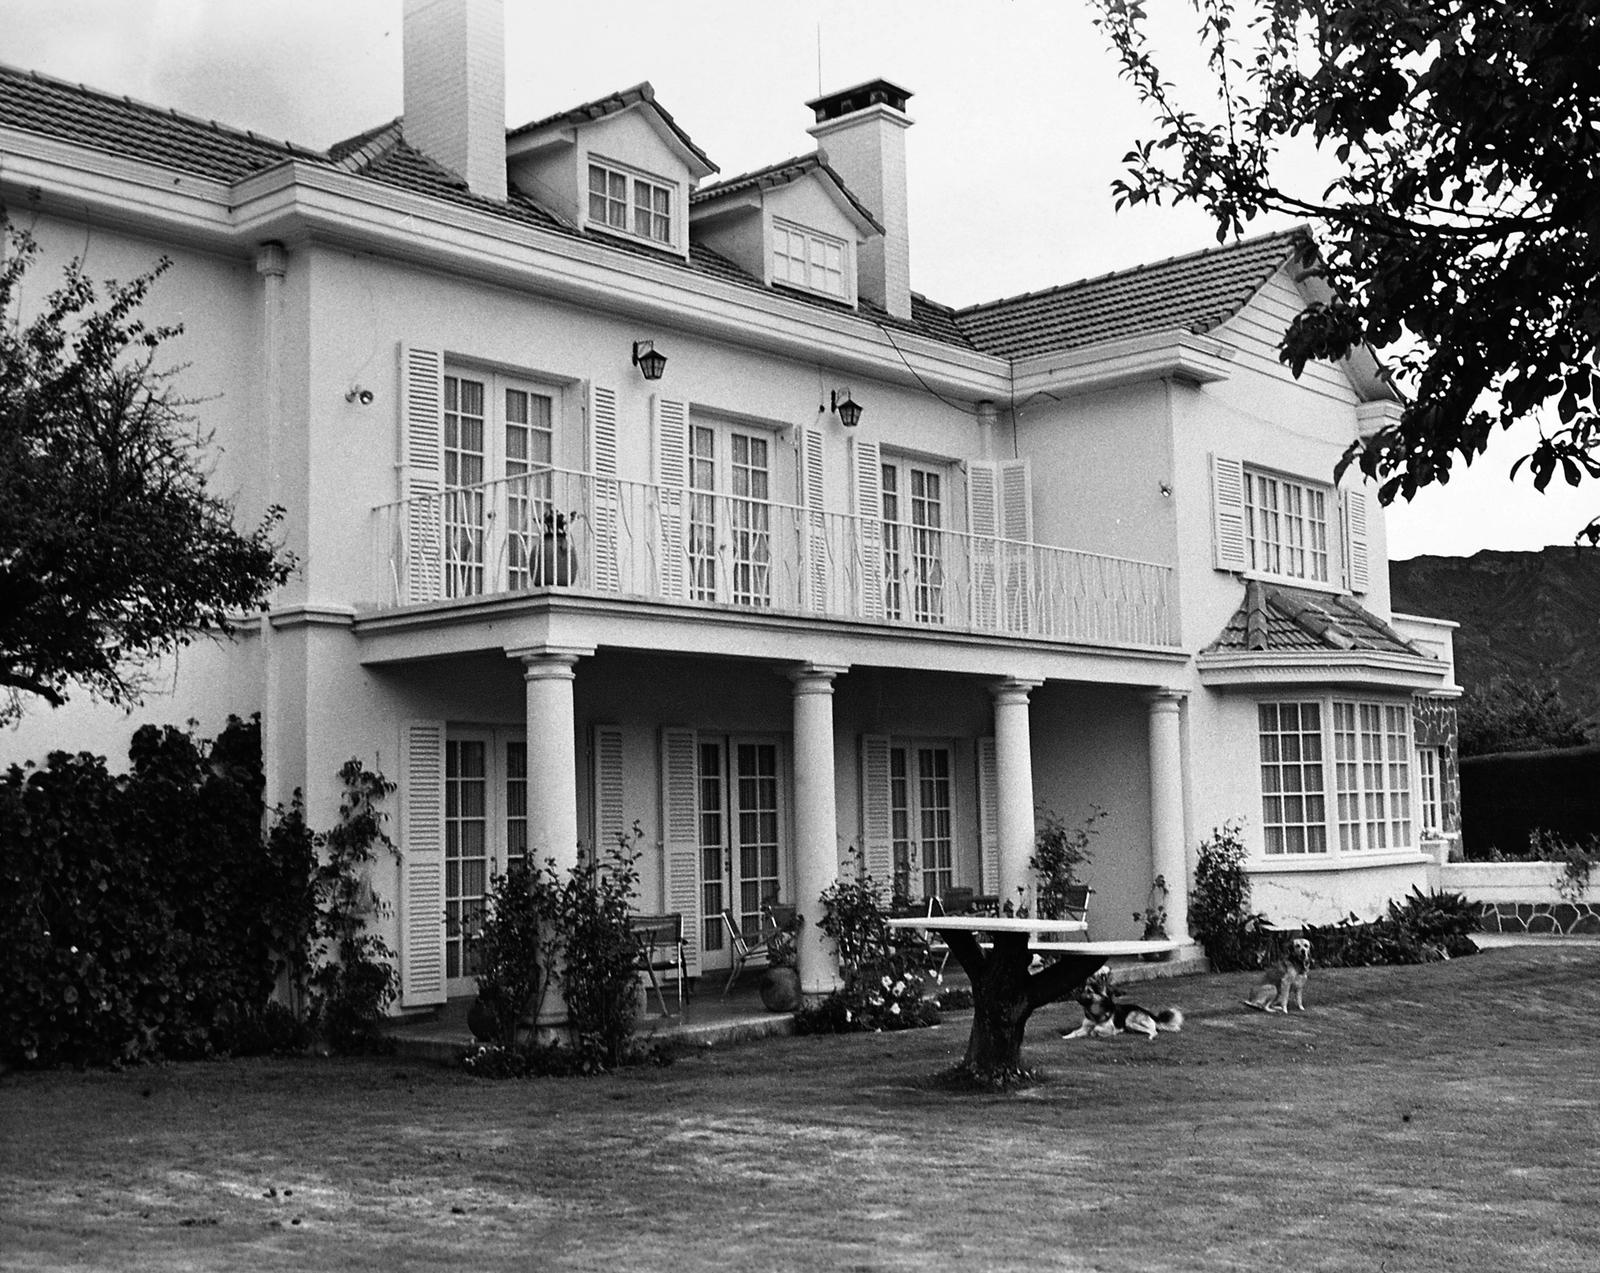 La Paz - Department of Defense Agency Head Residence - 1975